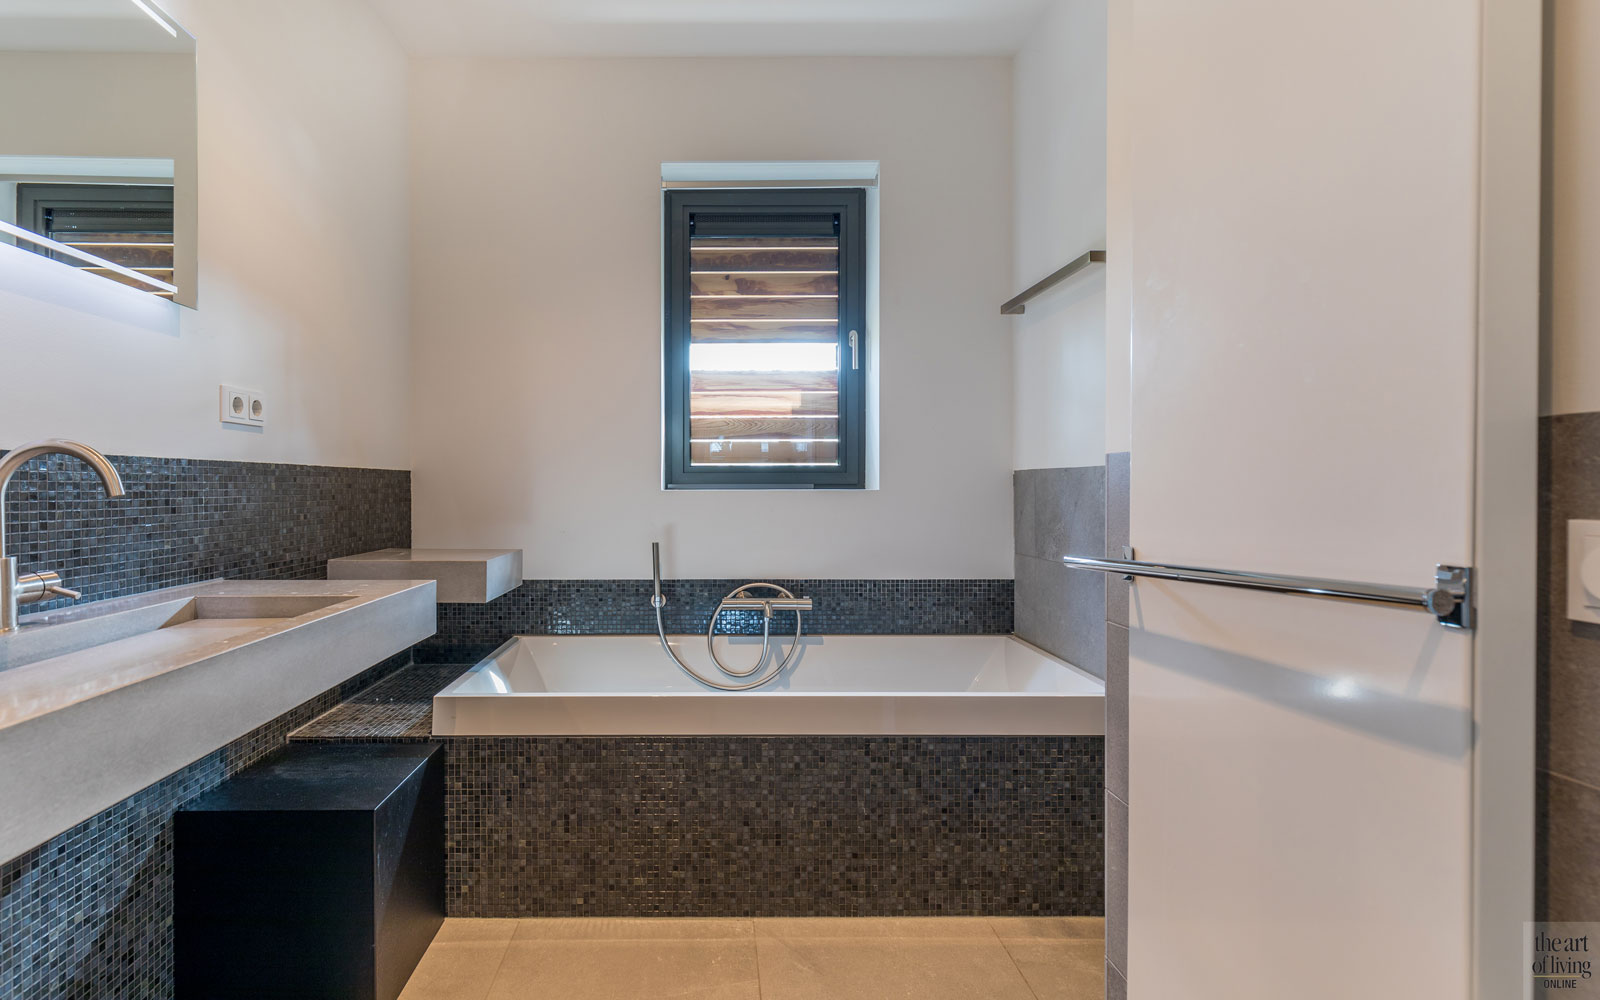 Badkamer, sanitair, bad, wastafel, duurzame villa, De Vries & Theunissen